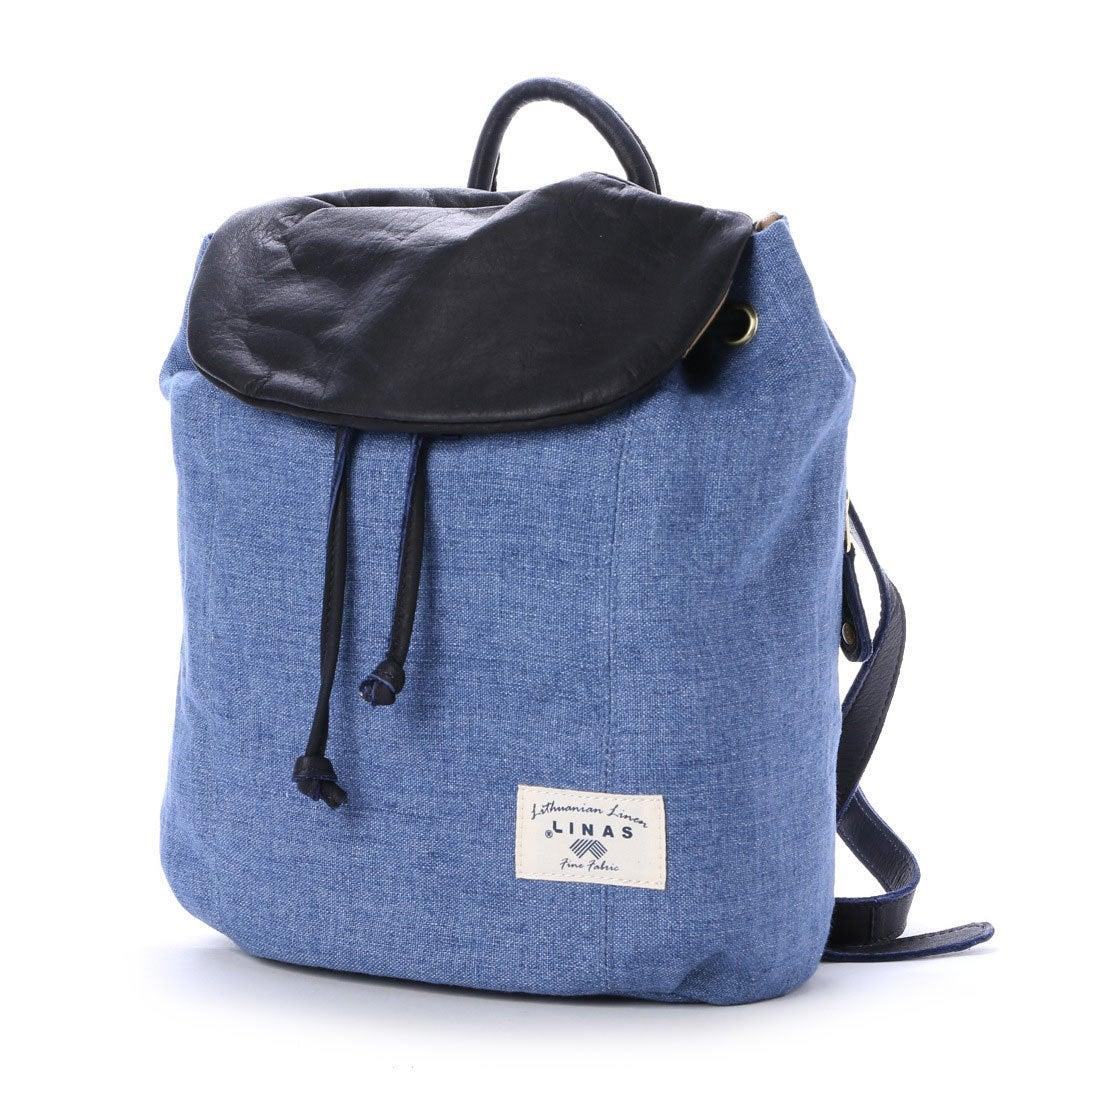 d8e1bdf705e96 カナナラ KUNUNURRA LINASミニリュック (blue) -靴&ファッション通販 ロコンド〜自宅で試着、気軽に返品